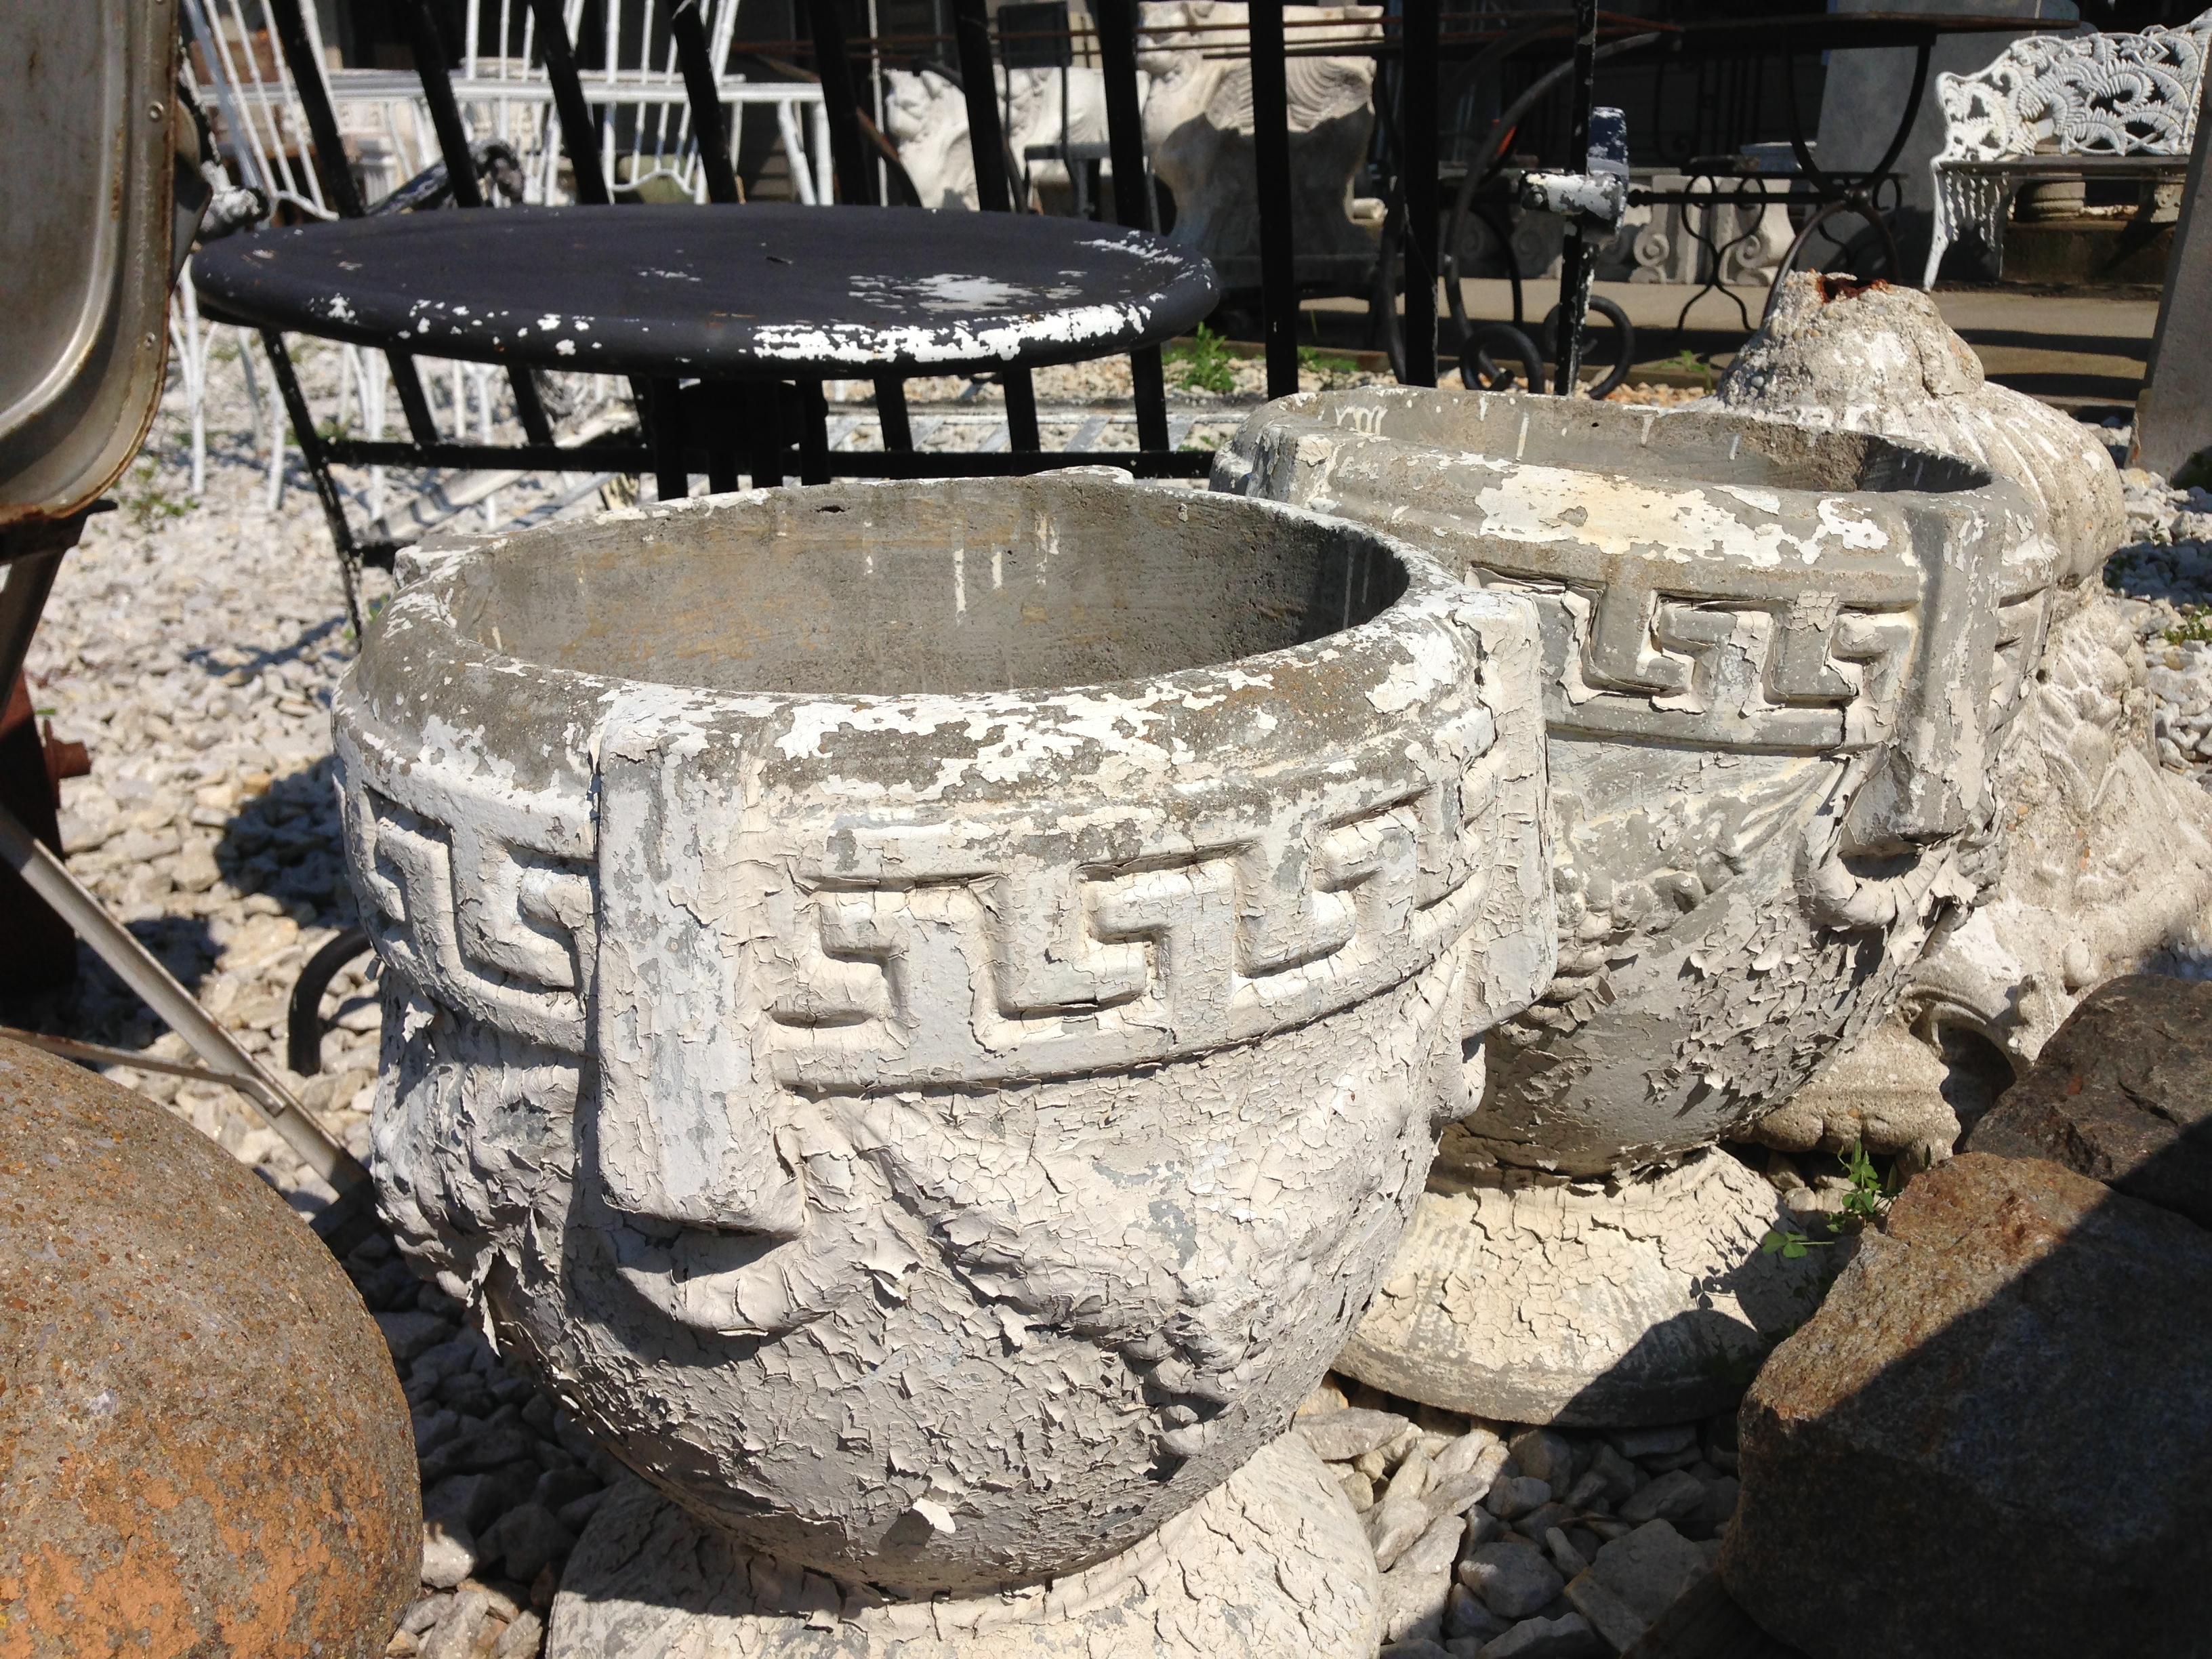 Greek Key Urn - Berkshire Home & Antiques